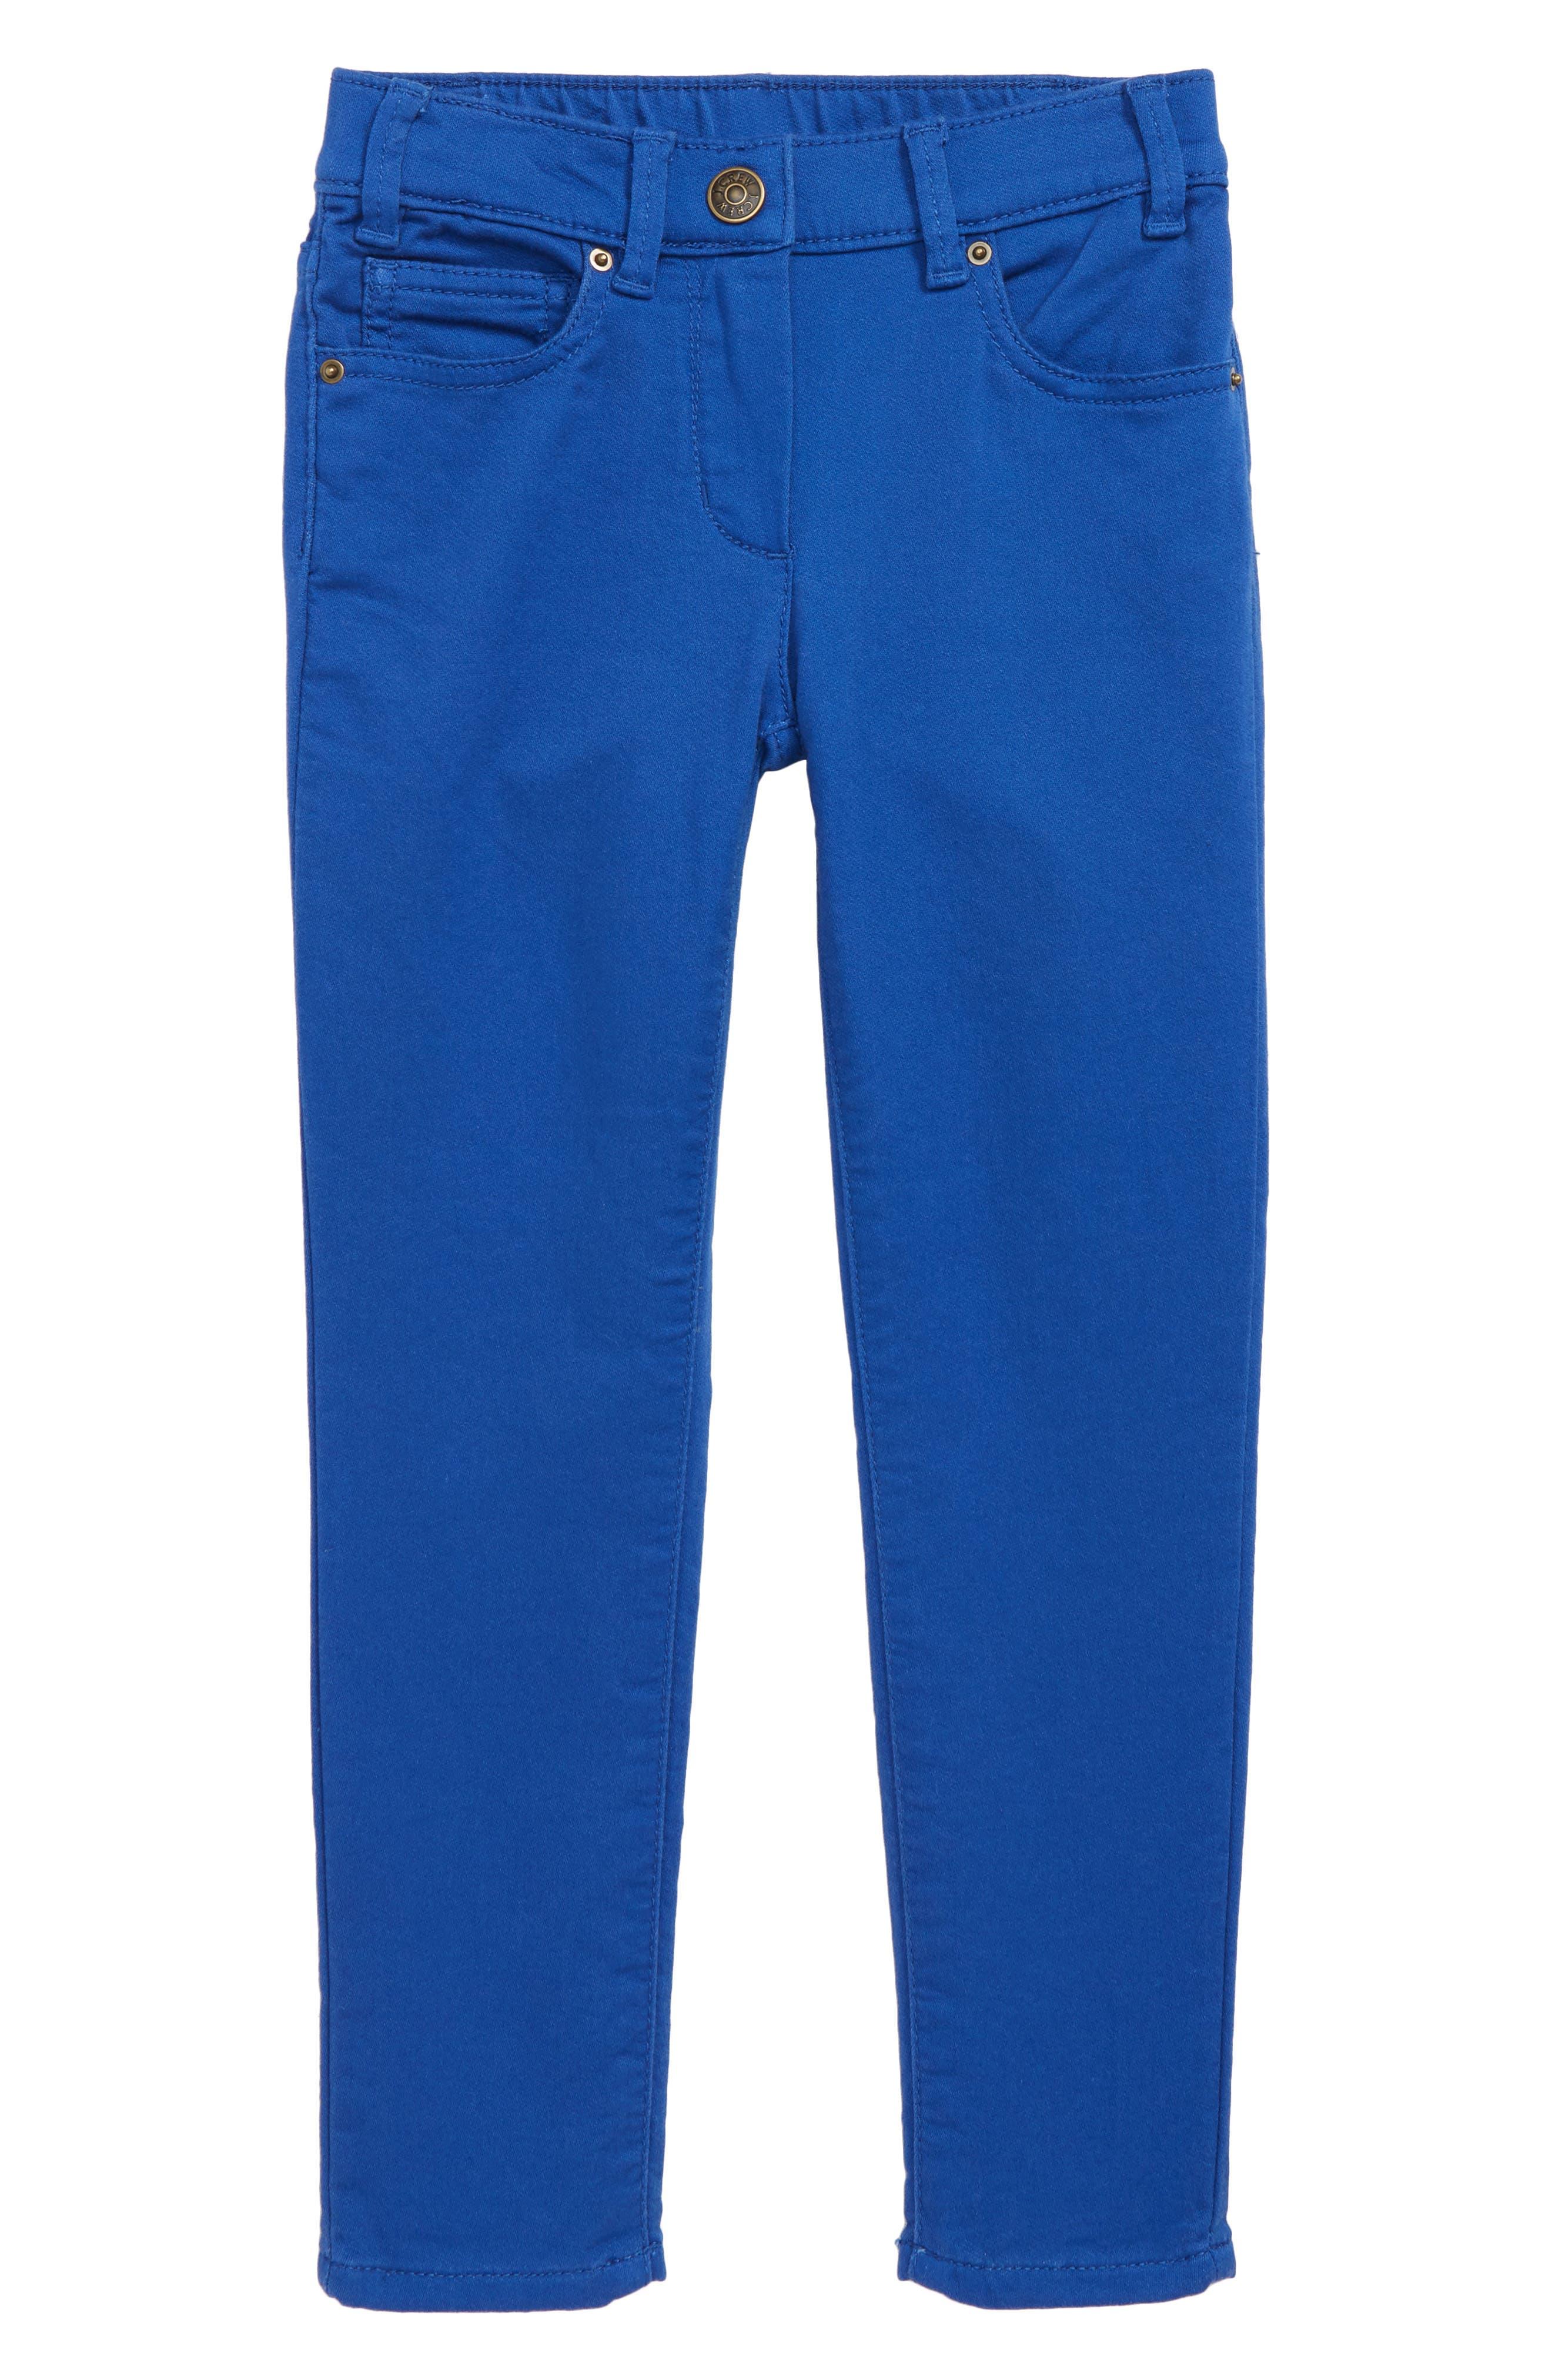 Runaround Garment Dye Jeans,                         Main,                         color, LAGOON BLUE